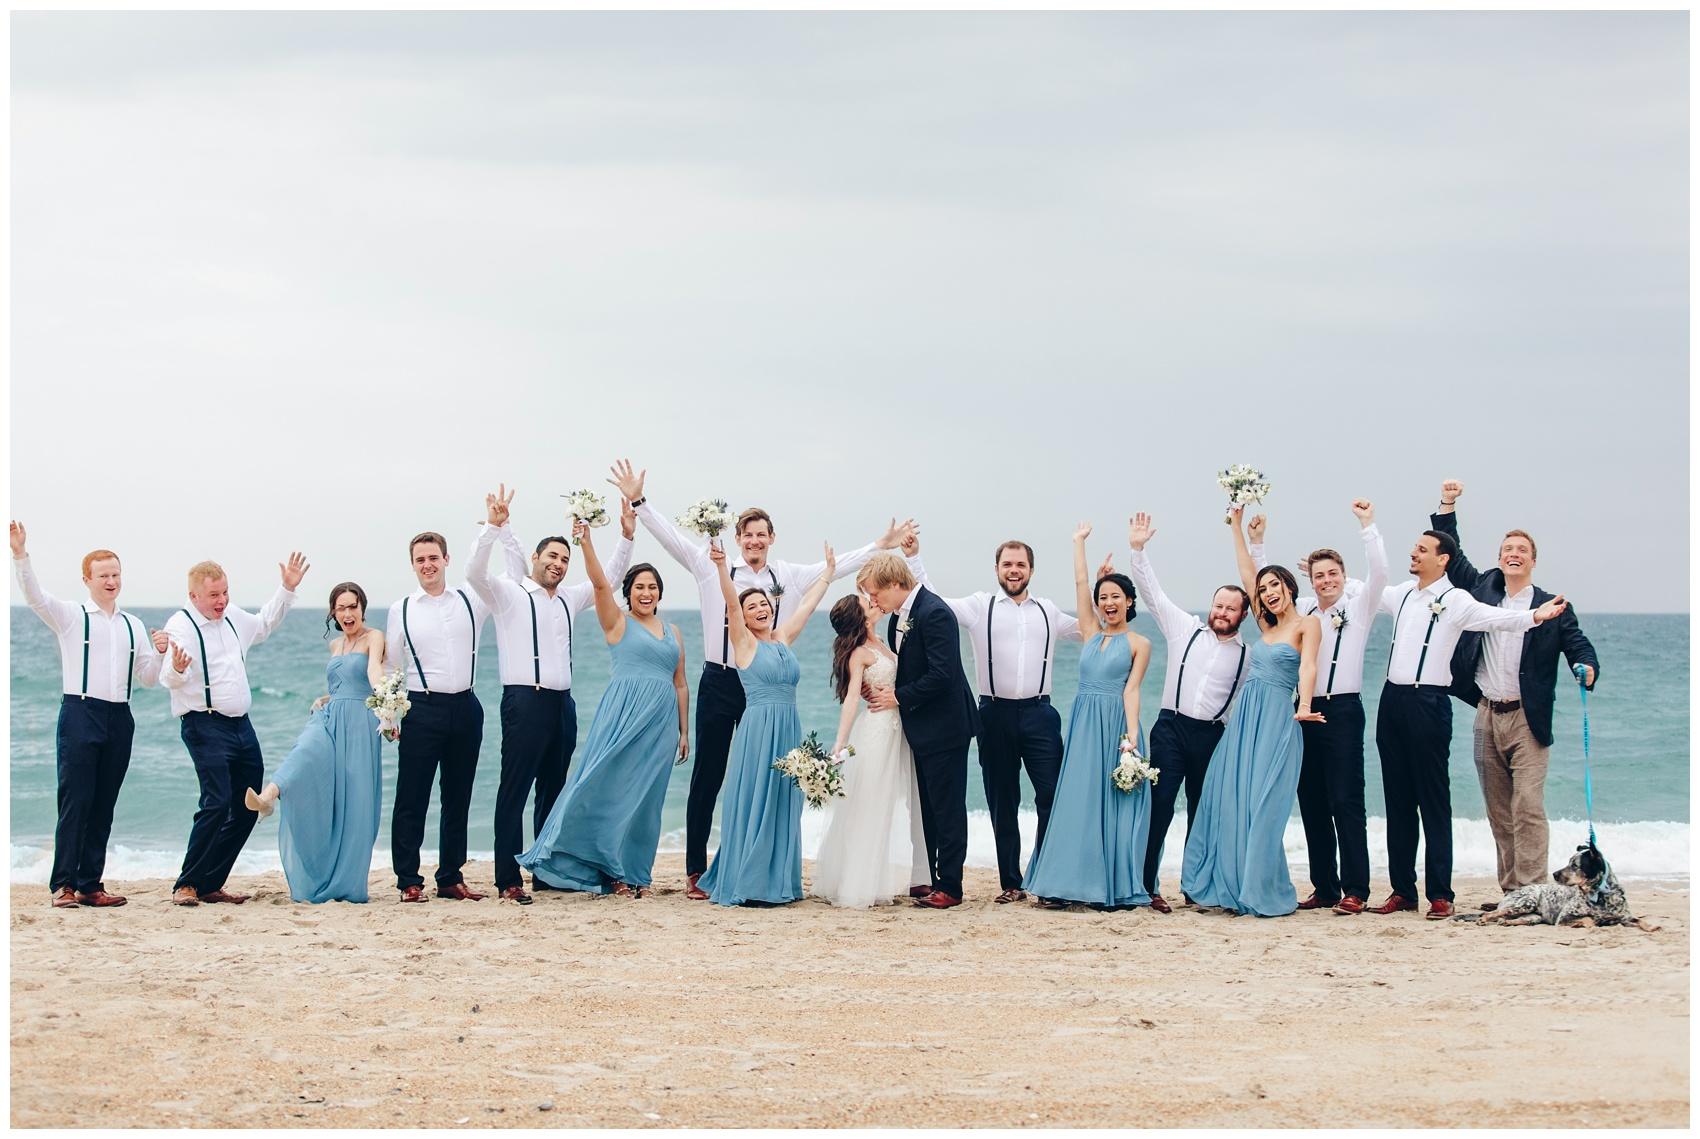 Outer-Banks-Corolla-Wedding_0078.jpg